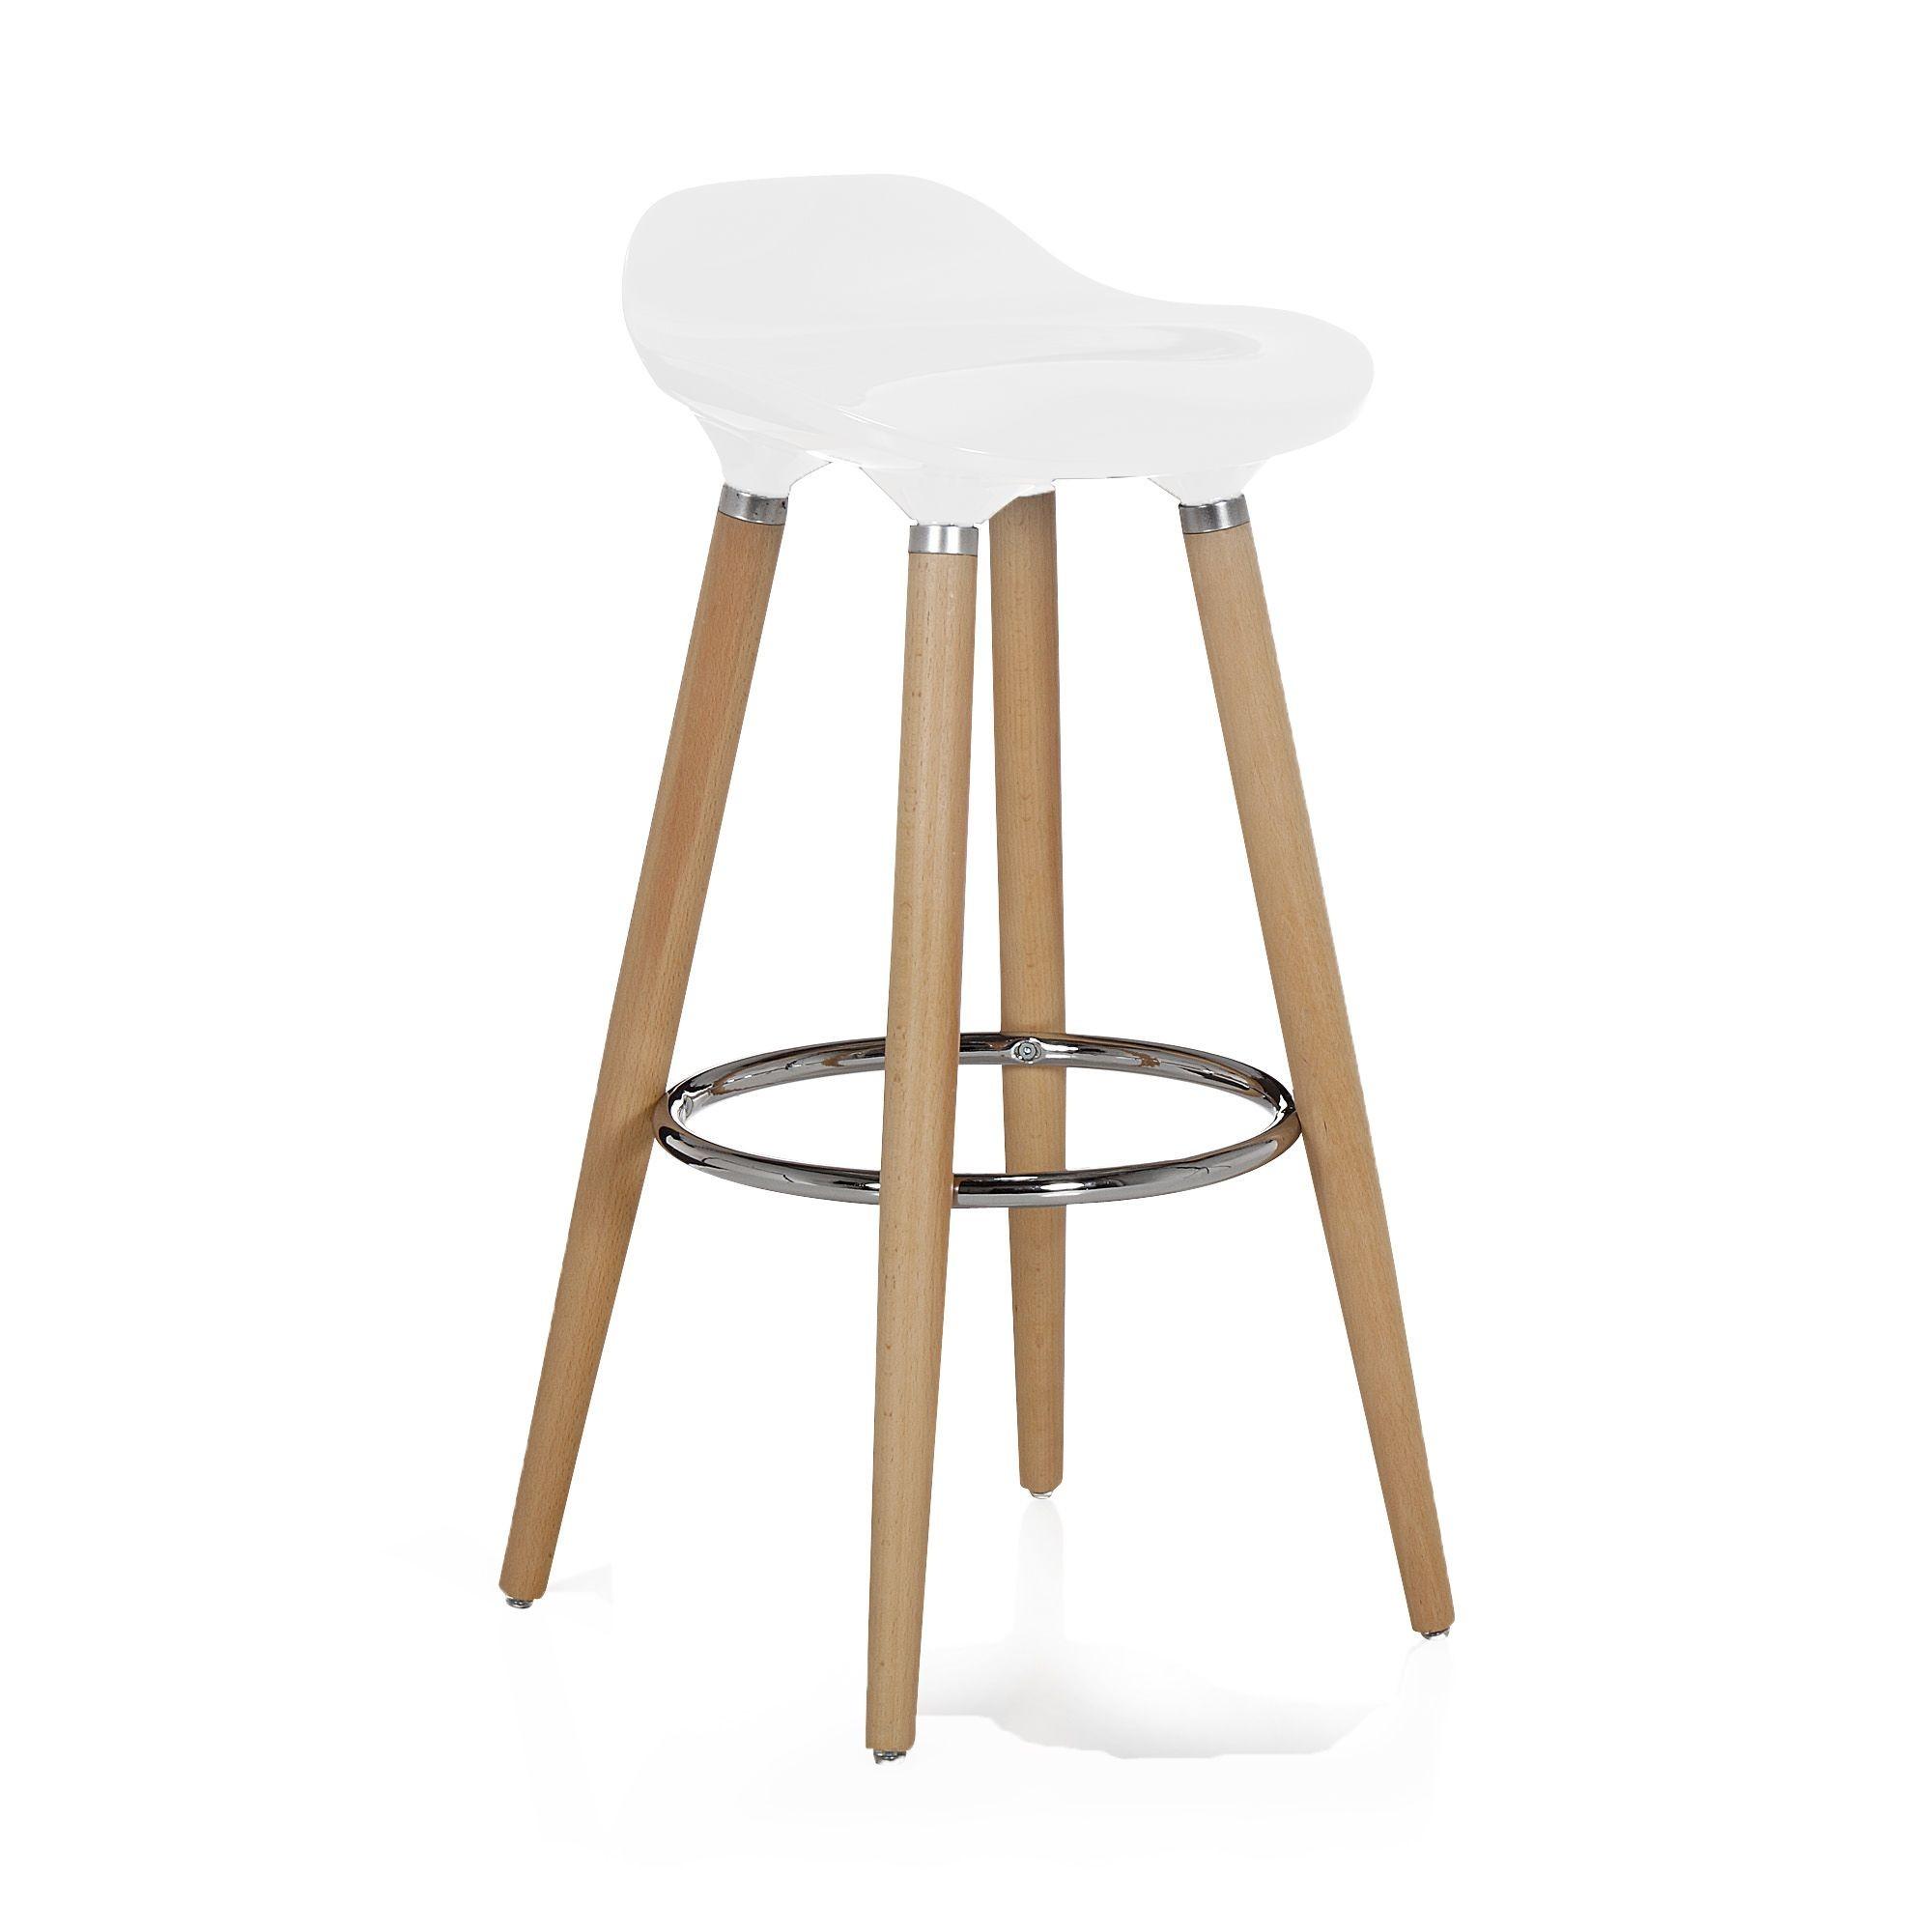 Tabouret Pour Coiffeuse Ikea Gamboahinestrosa